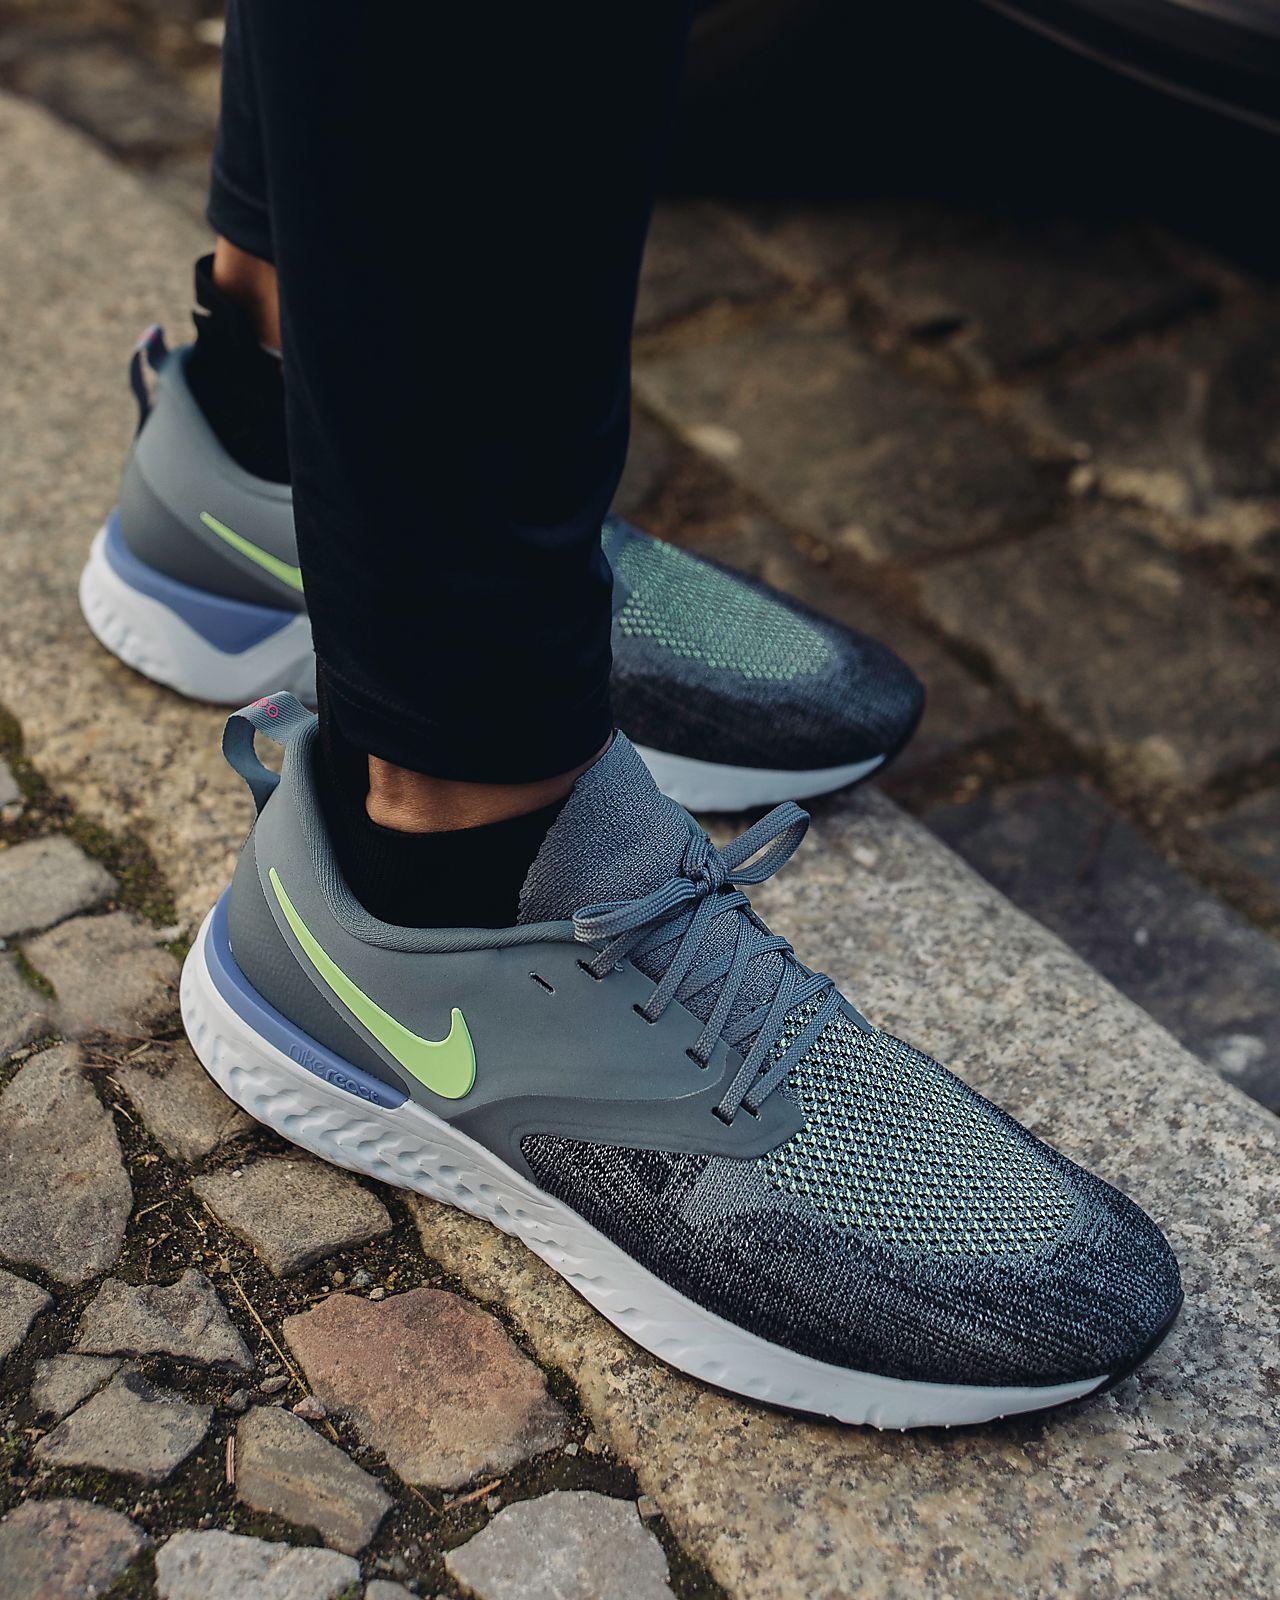 0bfcb2cabe74c Nike Odyssey React Flyknit 2 Men s Running Shoe. Nike.com ID